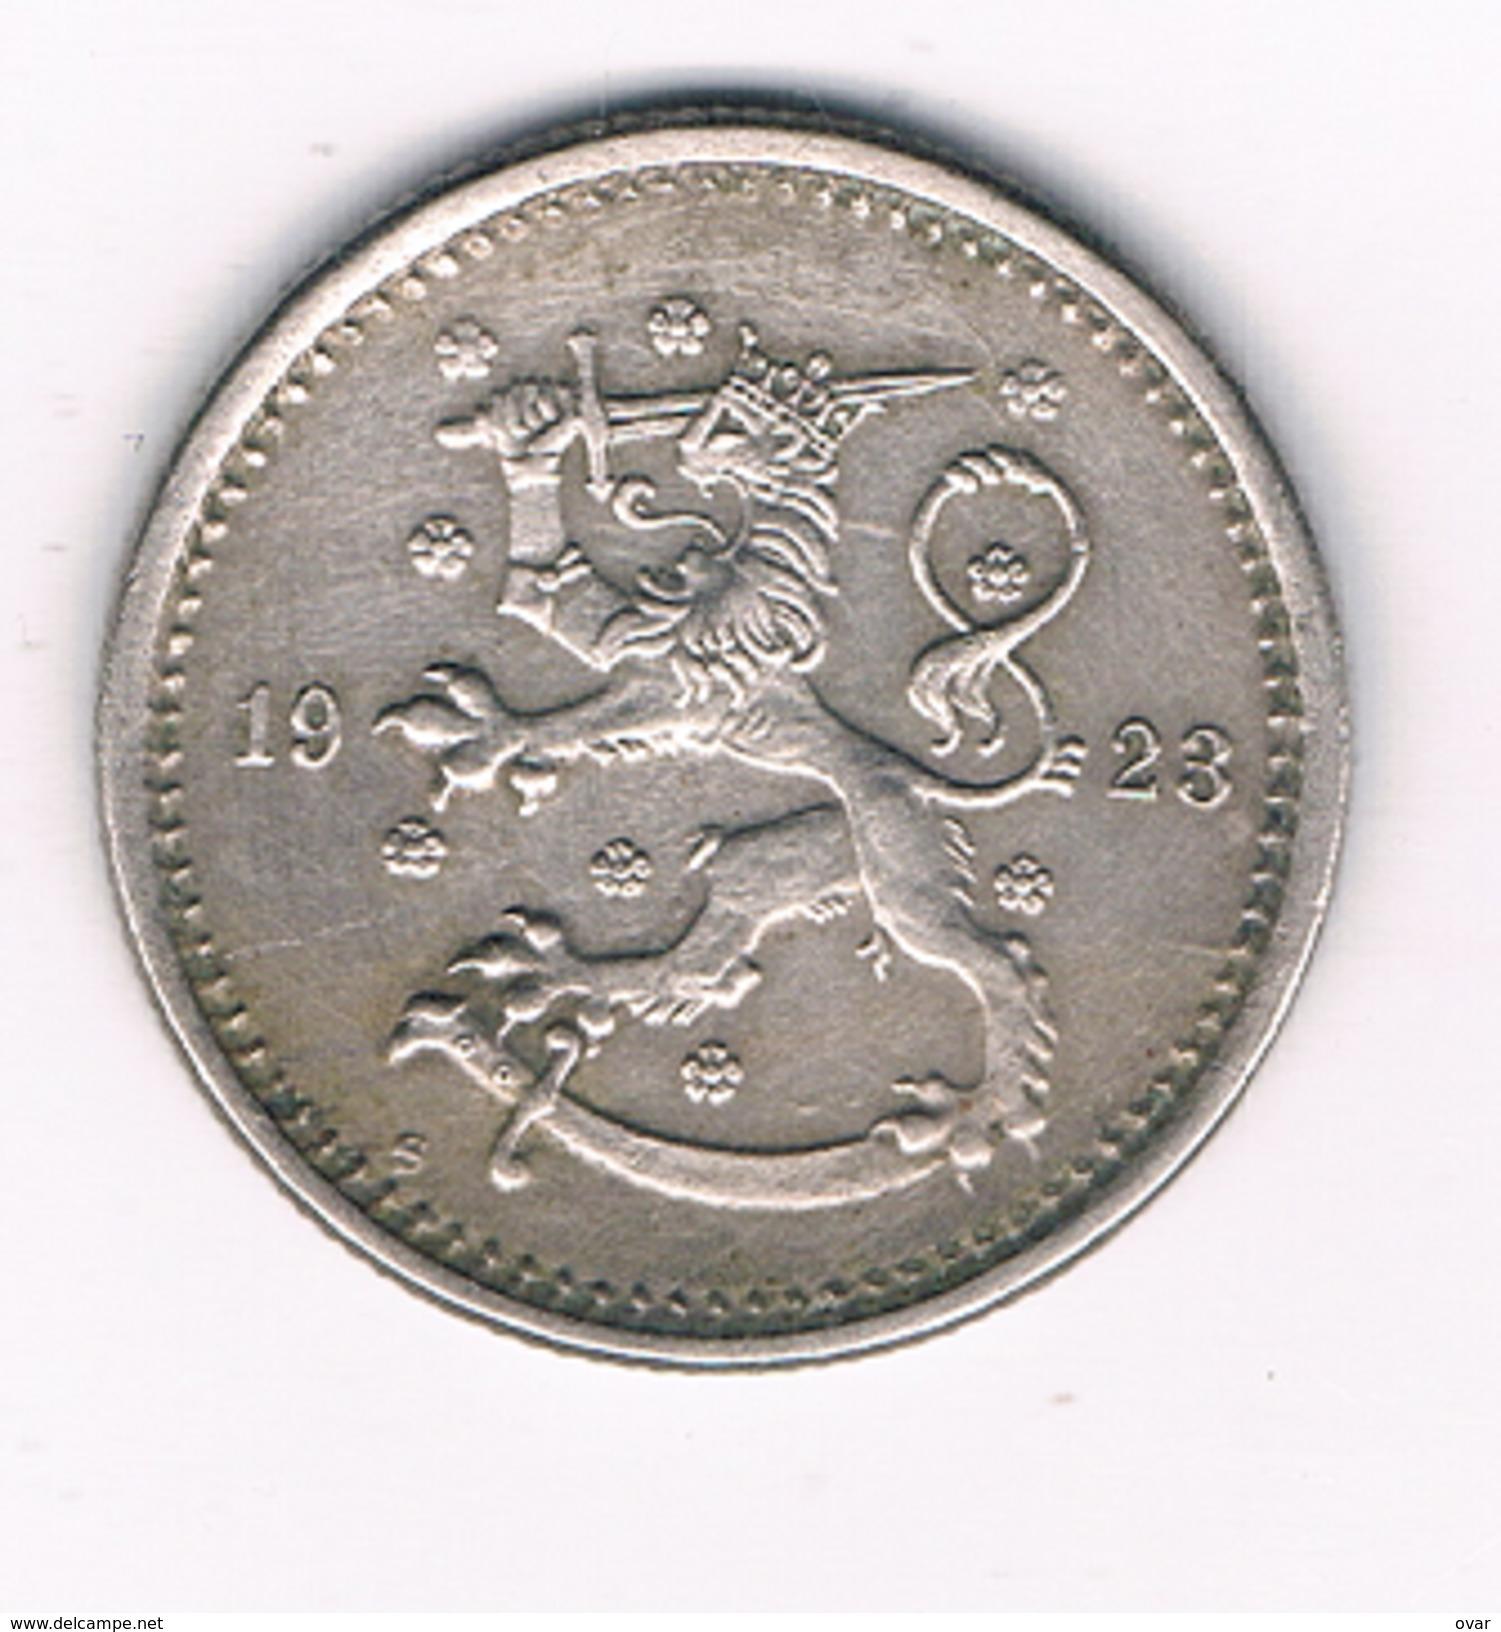 1 MARKKA 1923 FINLAND /1470C/ - Finlande